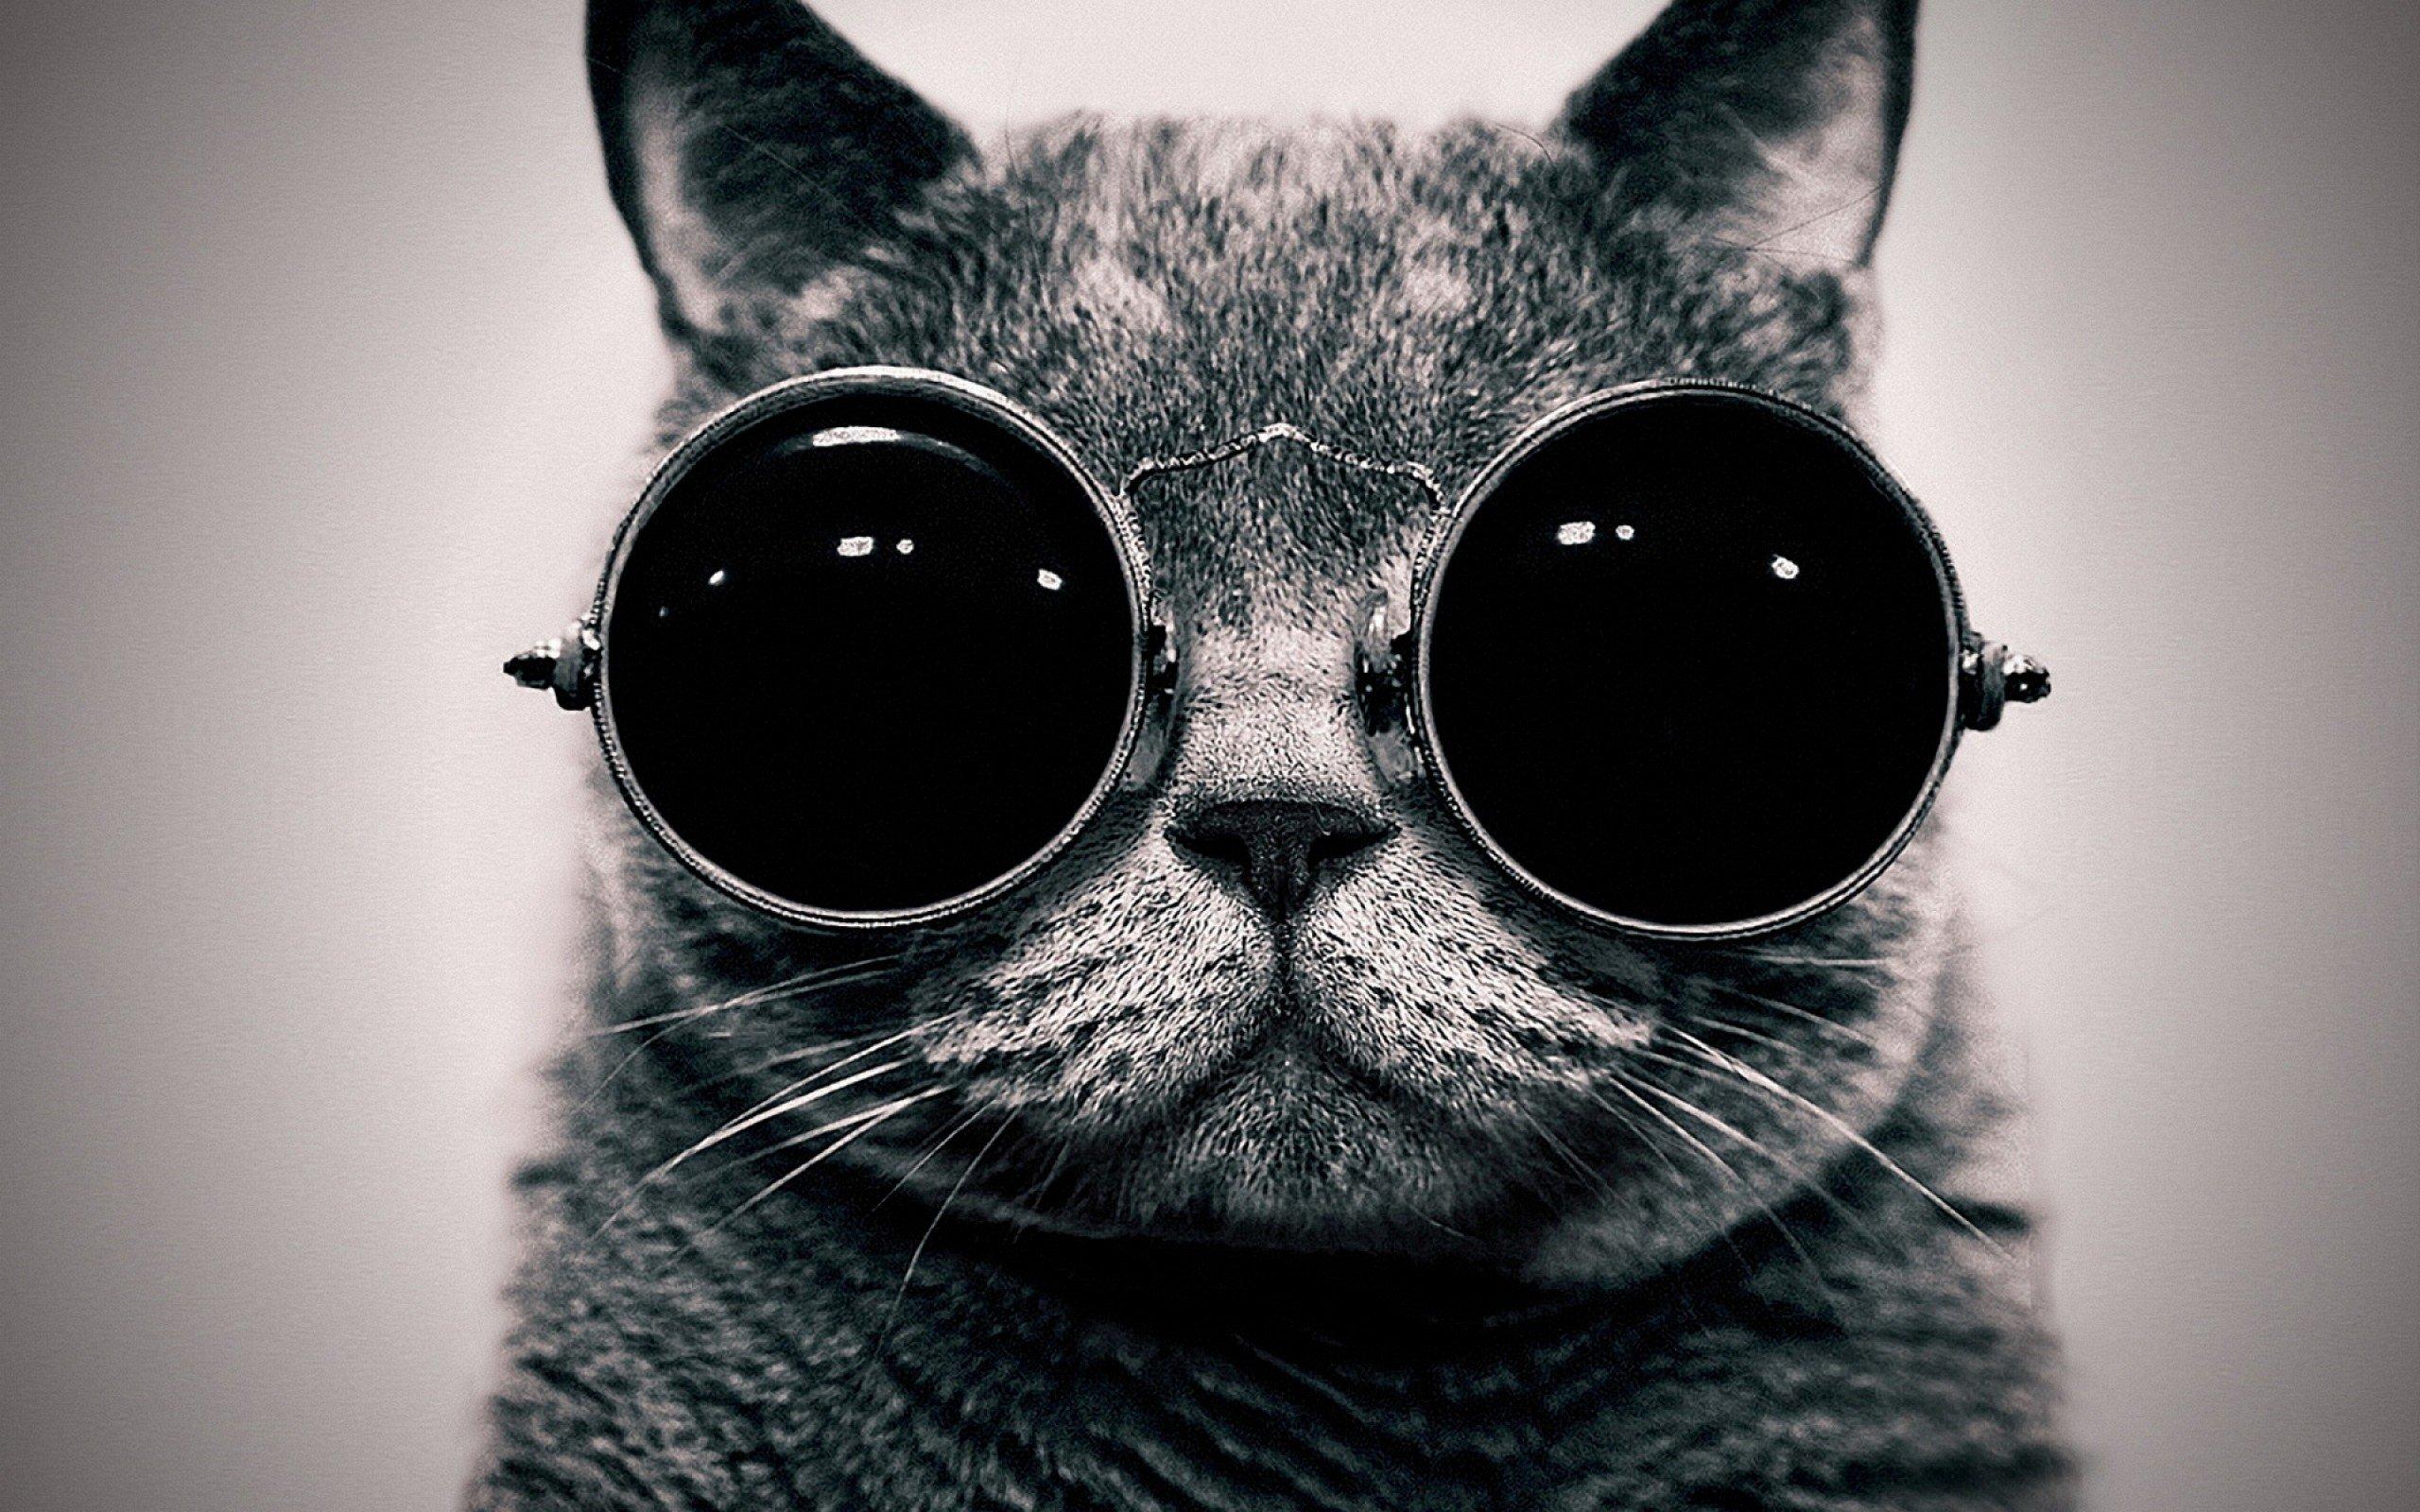 Cat In The Glasses Wallpaper   Download Wallpaper Nature 2560x1600